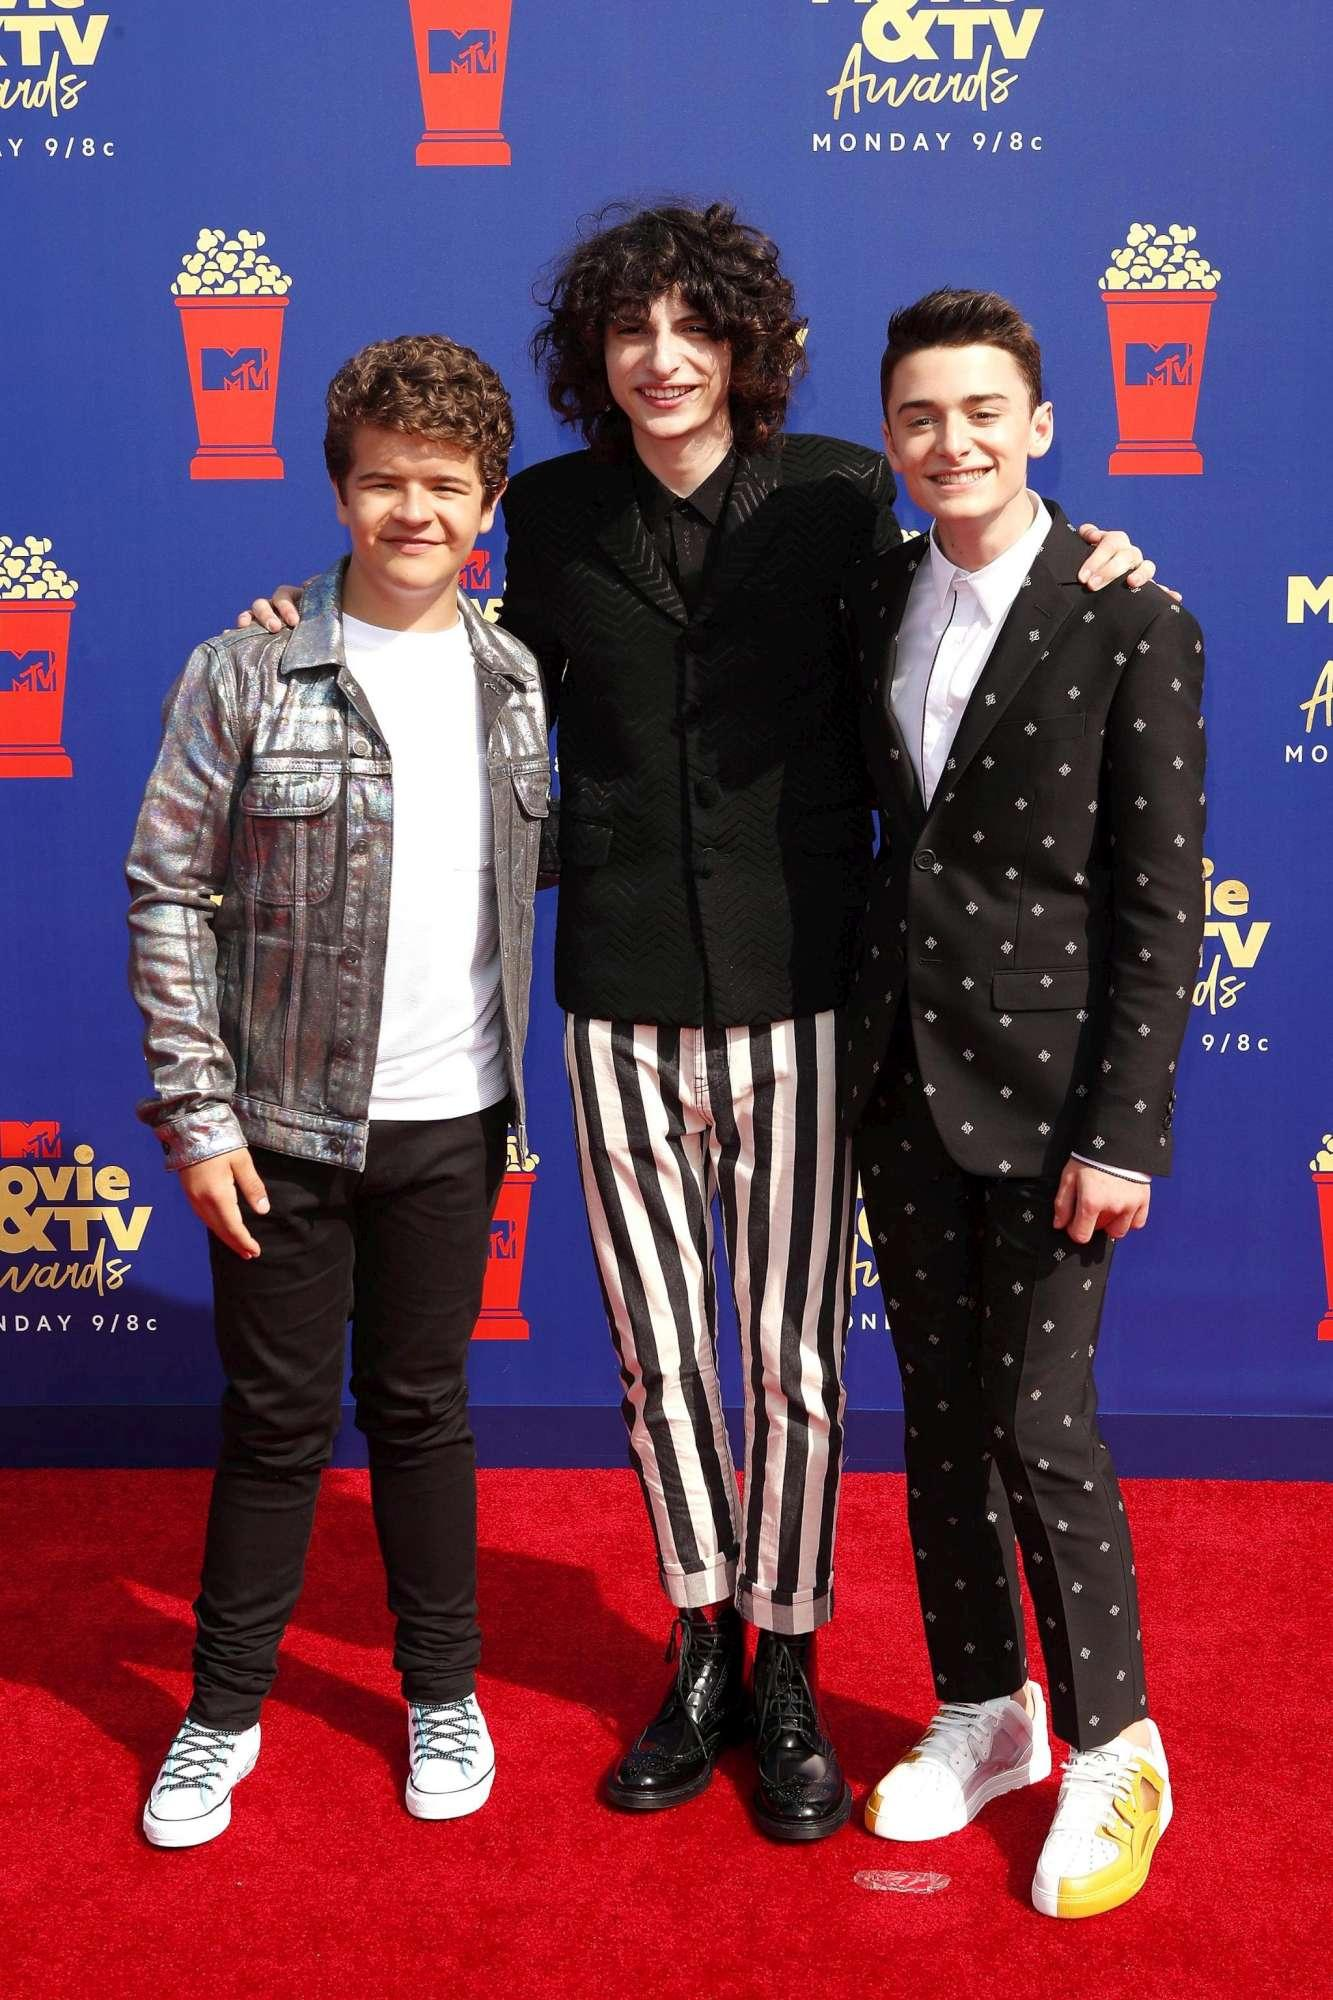 Mtv Movie e Tv Awards, i protagonisti della serata